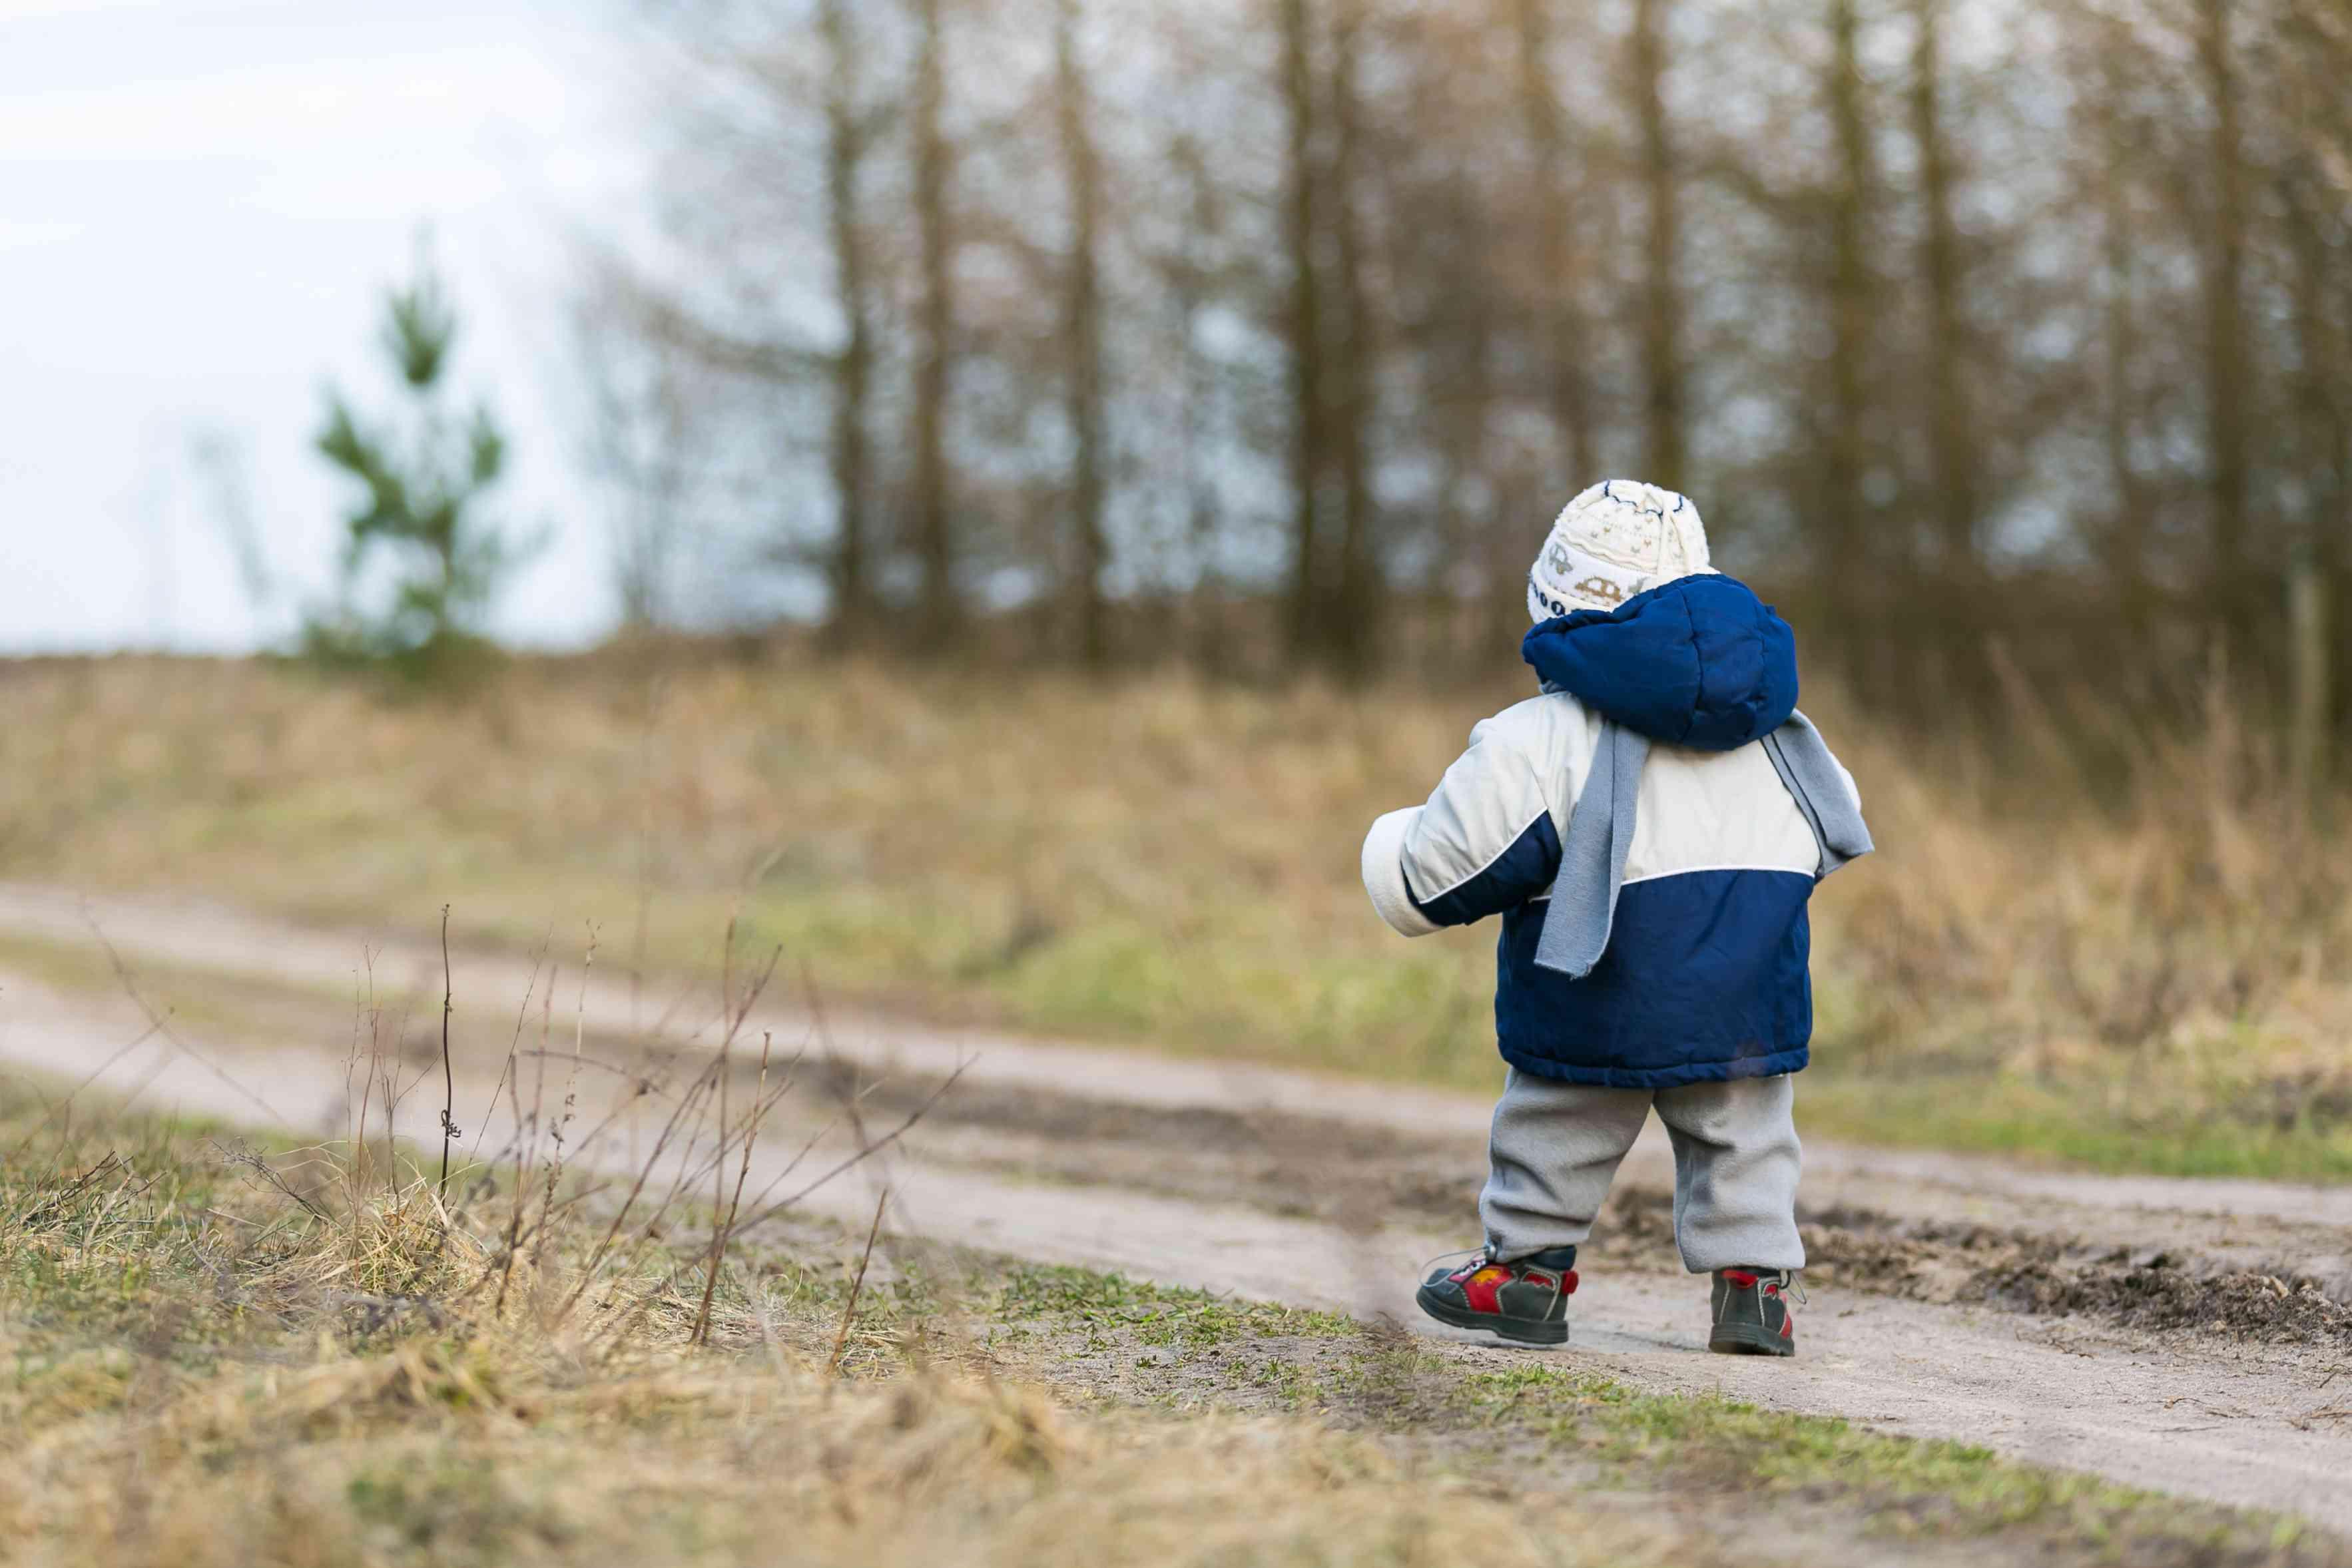 small child walks on rural sandy road